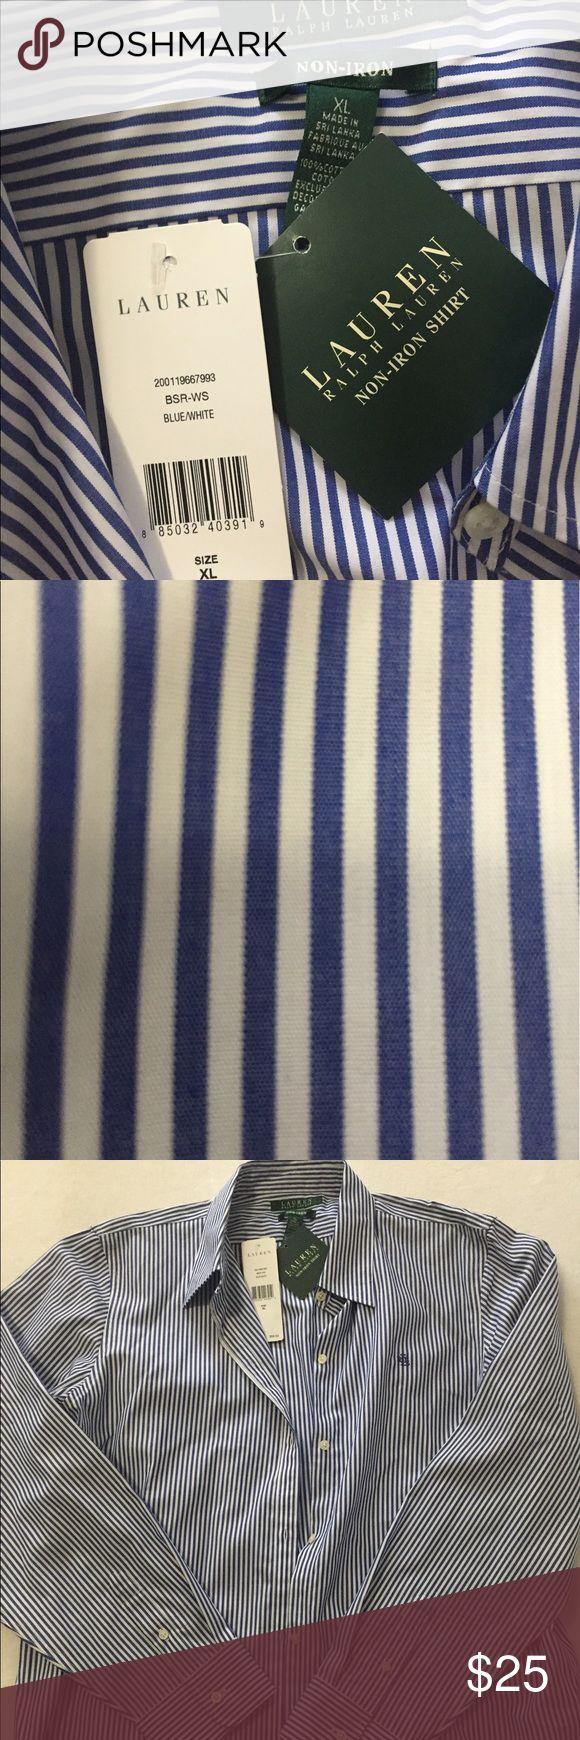 Ralph Lauren non-iron extra large women's shirt Ralph Lauren  Pinstripe blue and white non-iron women's extra-large Ralph Lauren Tops Button Down Shirts